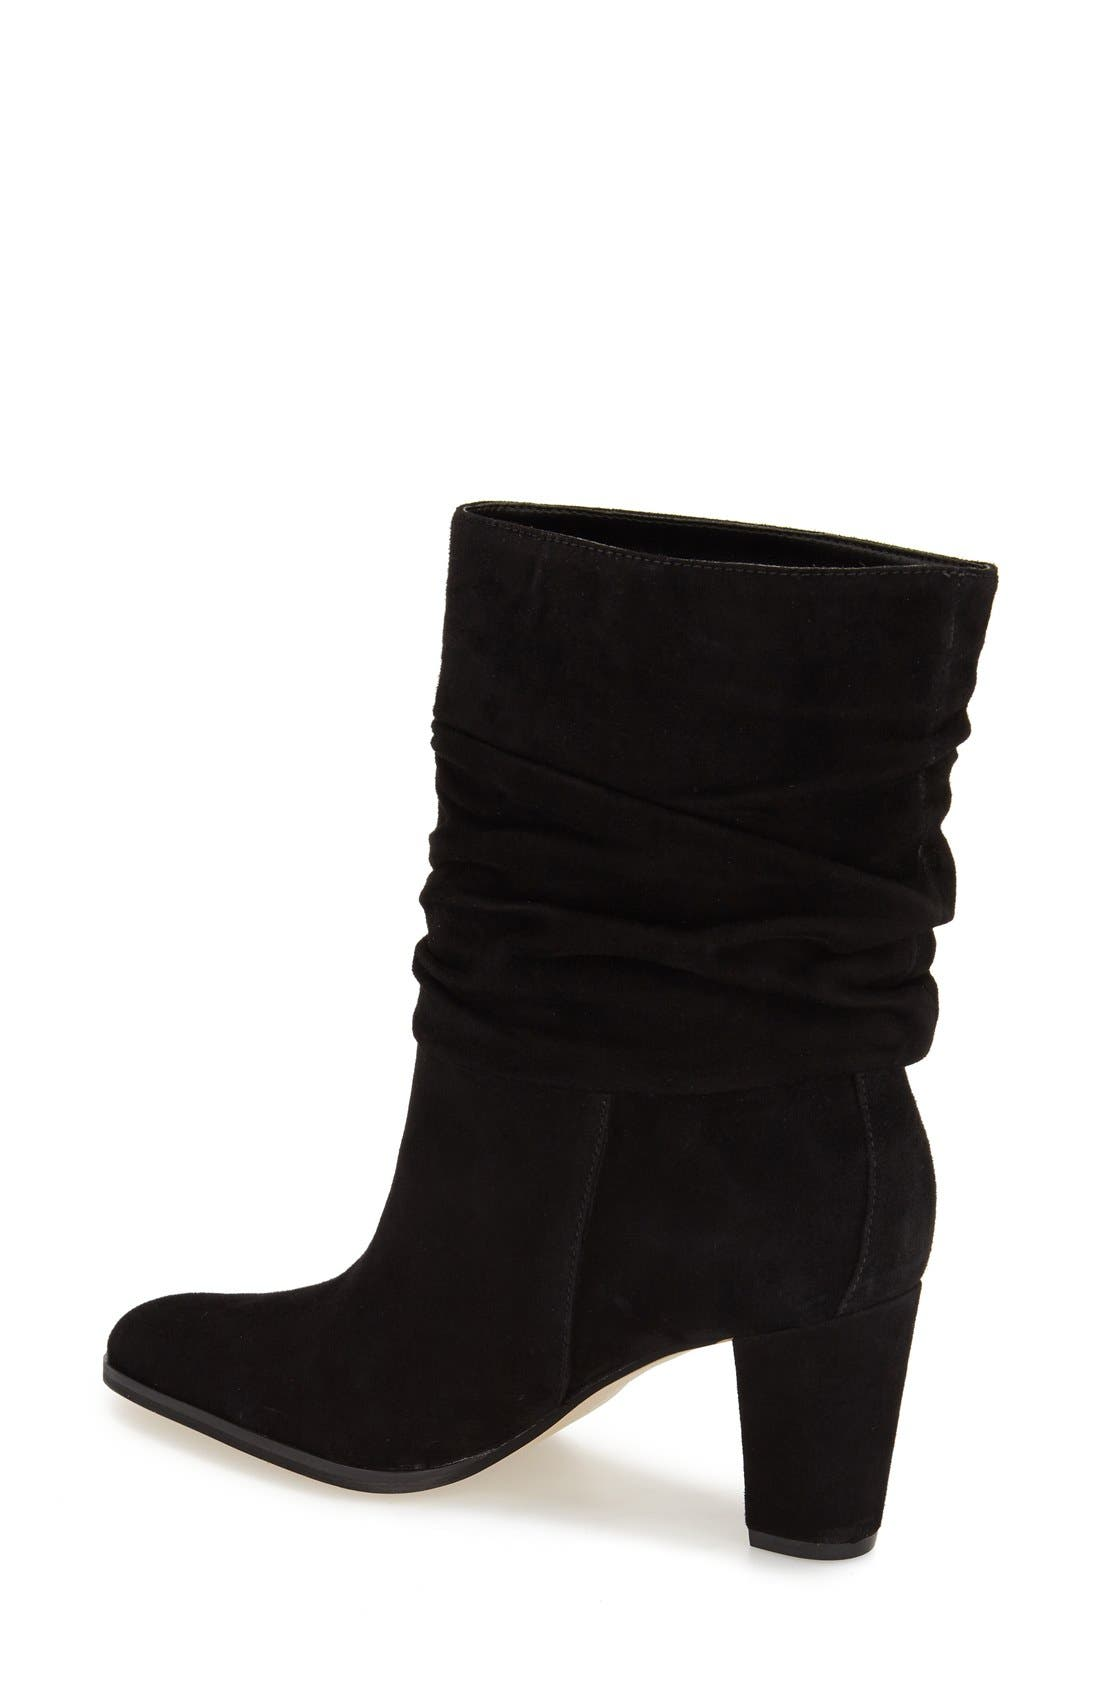 Alternate Image 2  - IvankaTrump 'Jalli' Ankle Boot (Women)